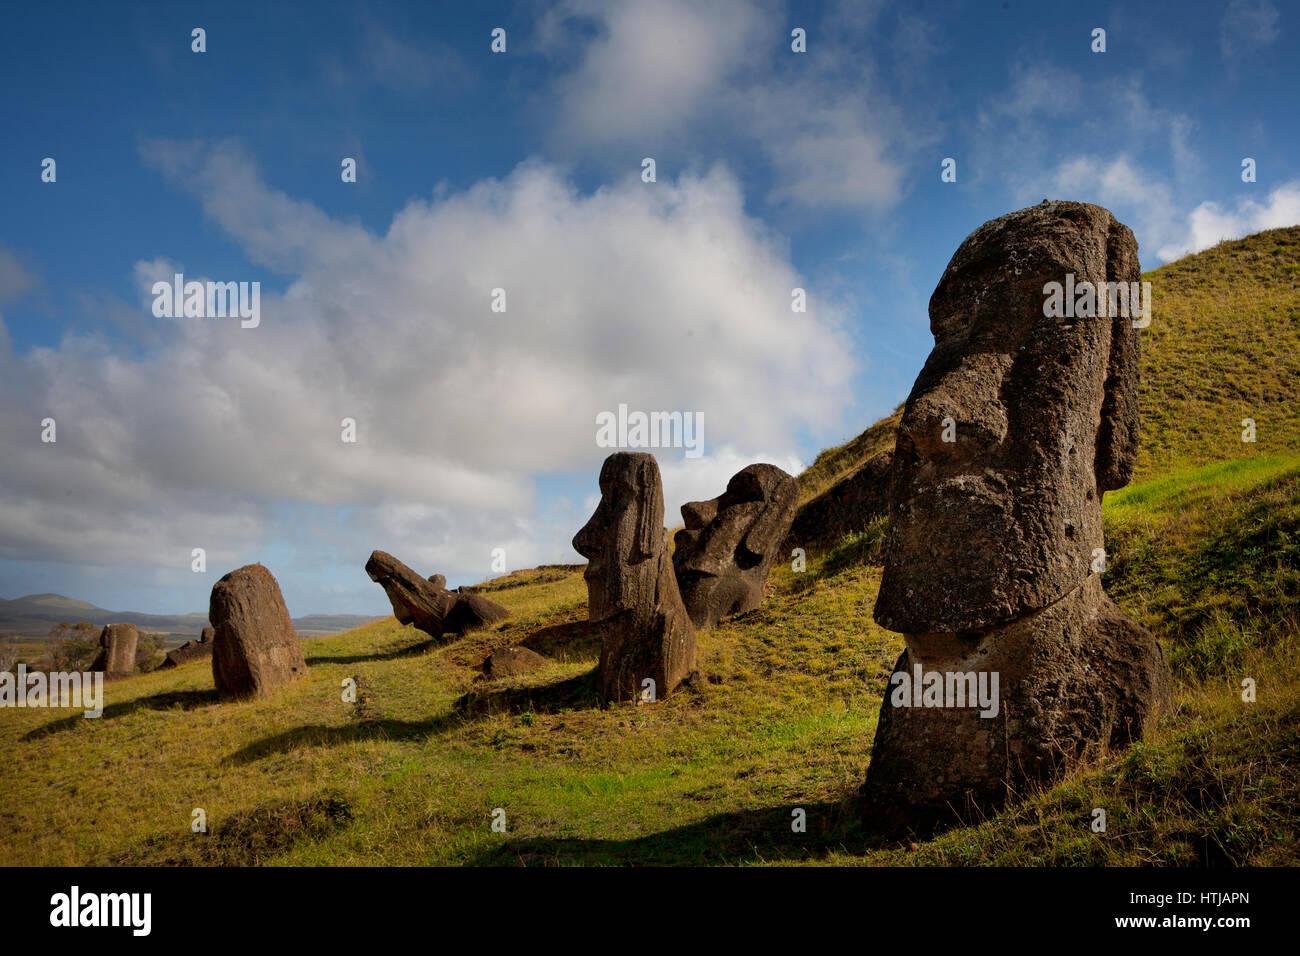 Riesige monolithische steinernen Moai Statuen am Rano Raraku, Rapa Nui (Osterinsel), UNESCO-Weltkulturerbe, Chile, Stockbild